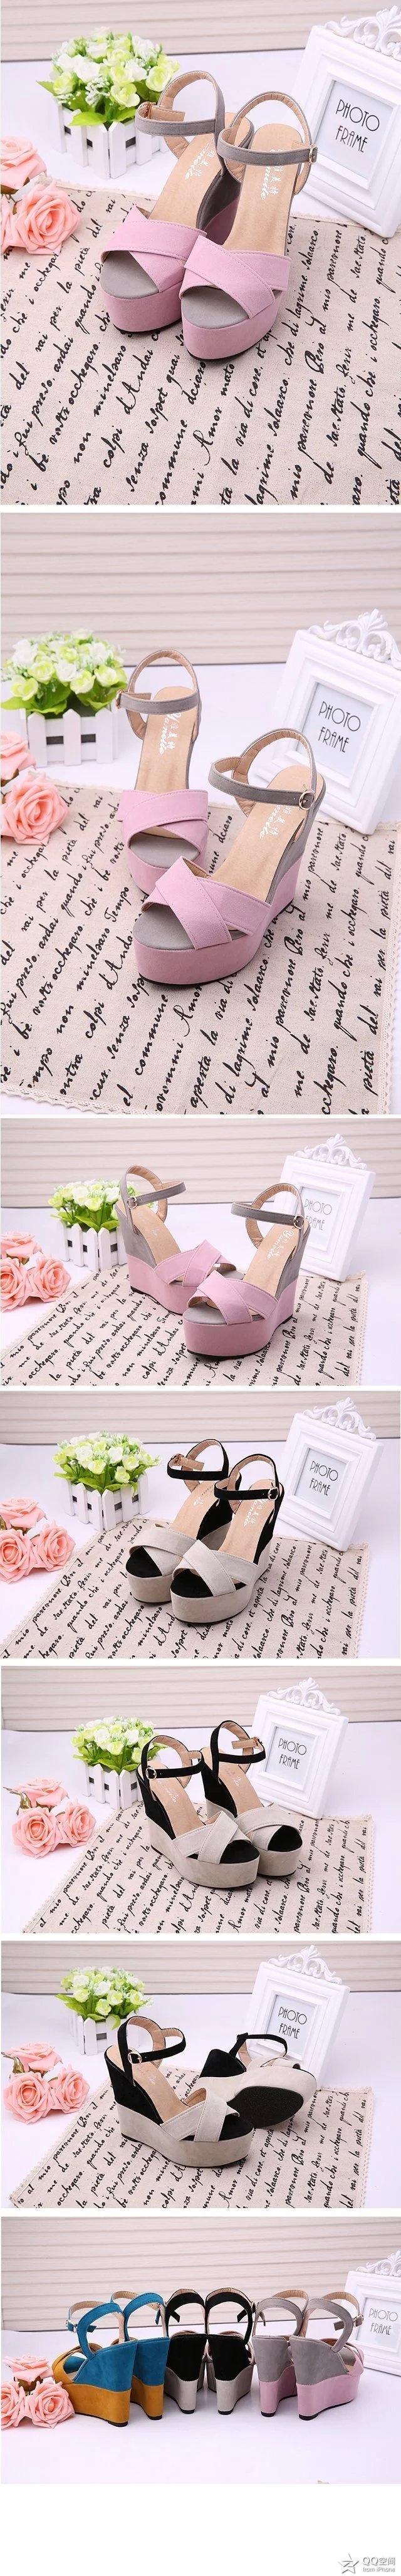 2018 Women Fish Mouth Platform High Heels Wedge Sandals Buckle Slope Sandals Women's High Heel Shoes 4